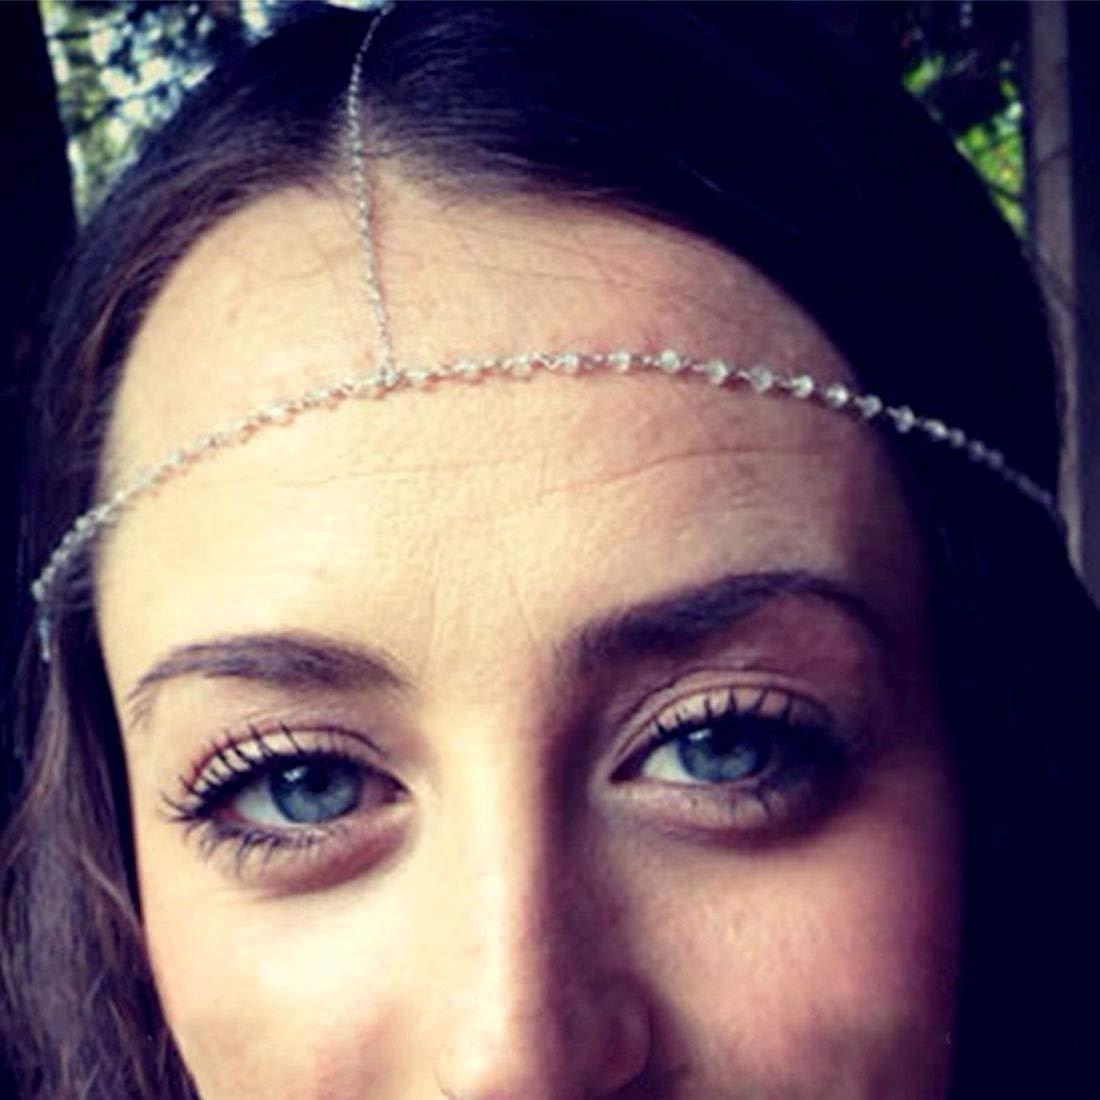 Fashband Crystal Head Chain Boho Headband Vintage Inspired Forehead Jeweled Headpiece Fantasy Crown Tiara Fashion Hair Accessory Festival Jewelry for Women and Girls (Gold)